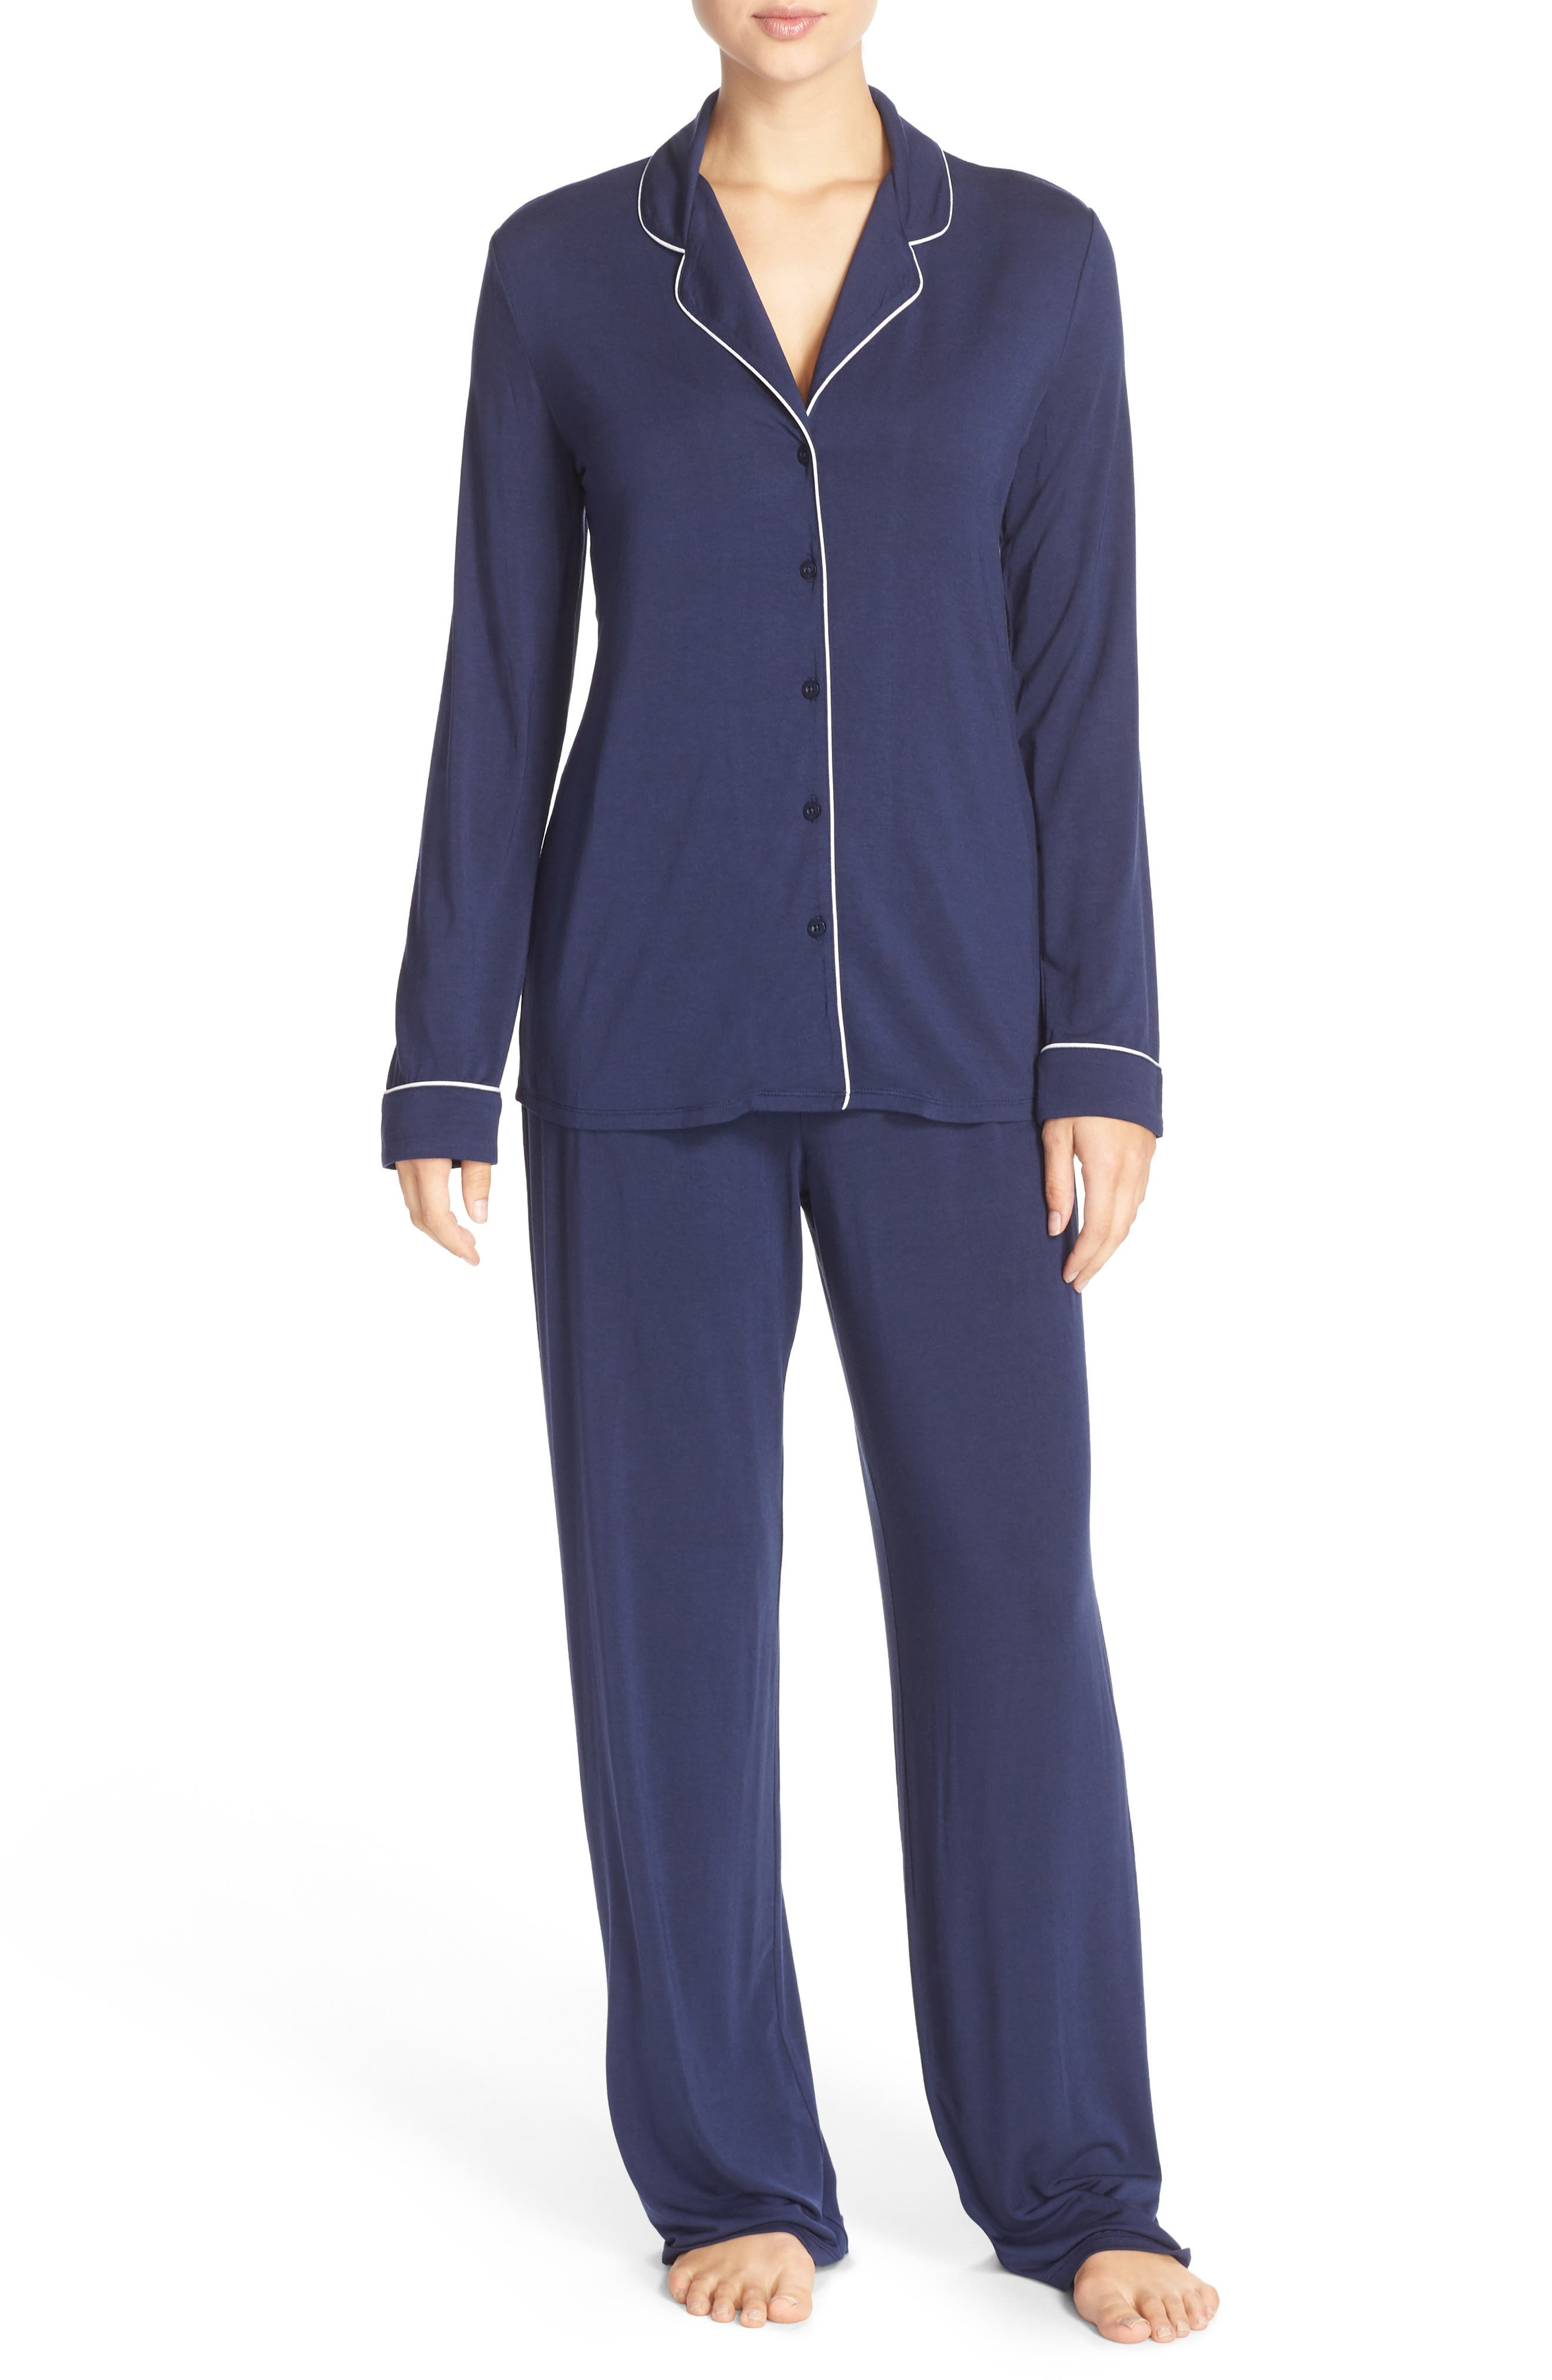 Moonlight Pajamas,                         Main,                         color, Navy Peacoat